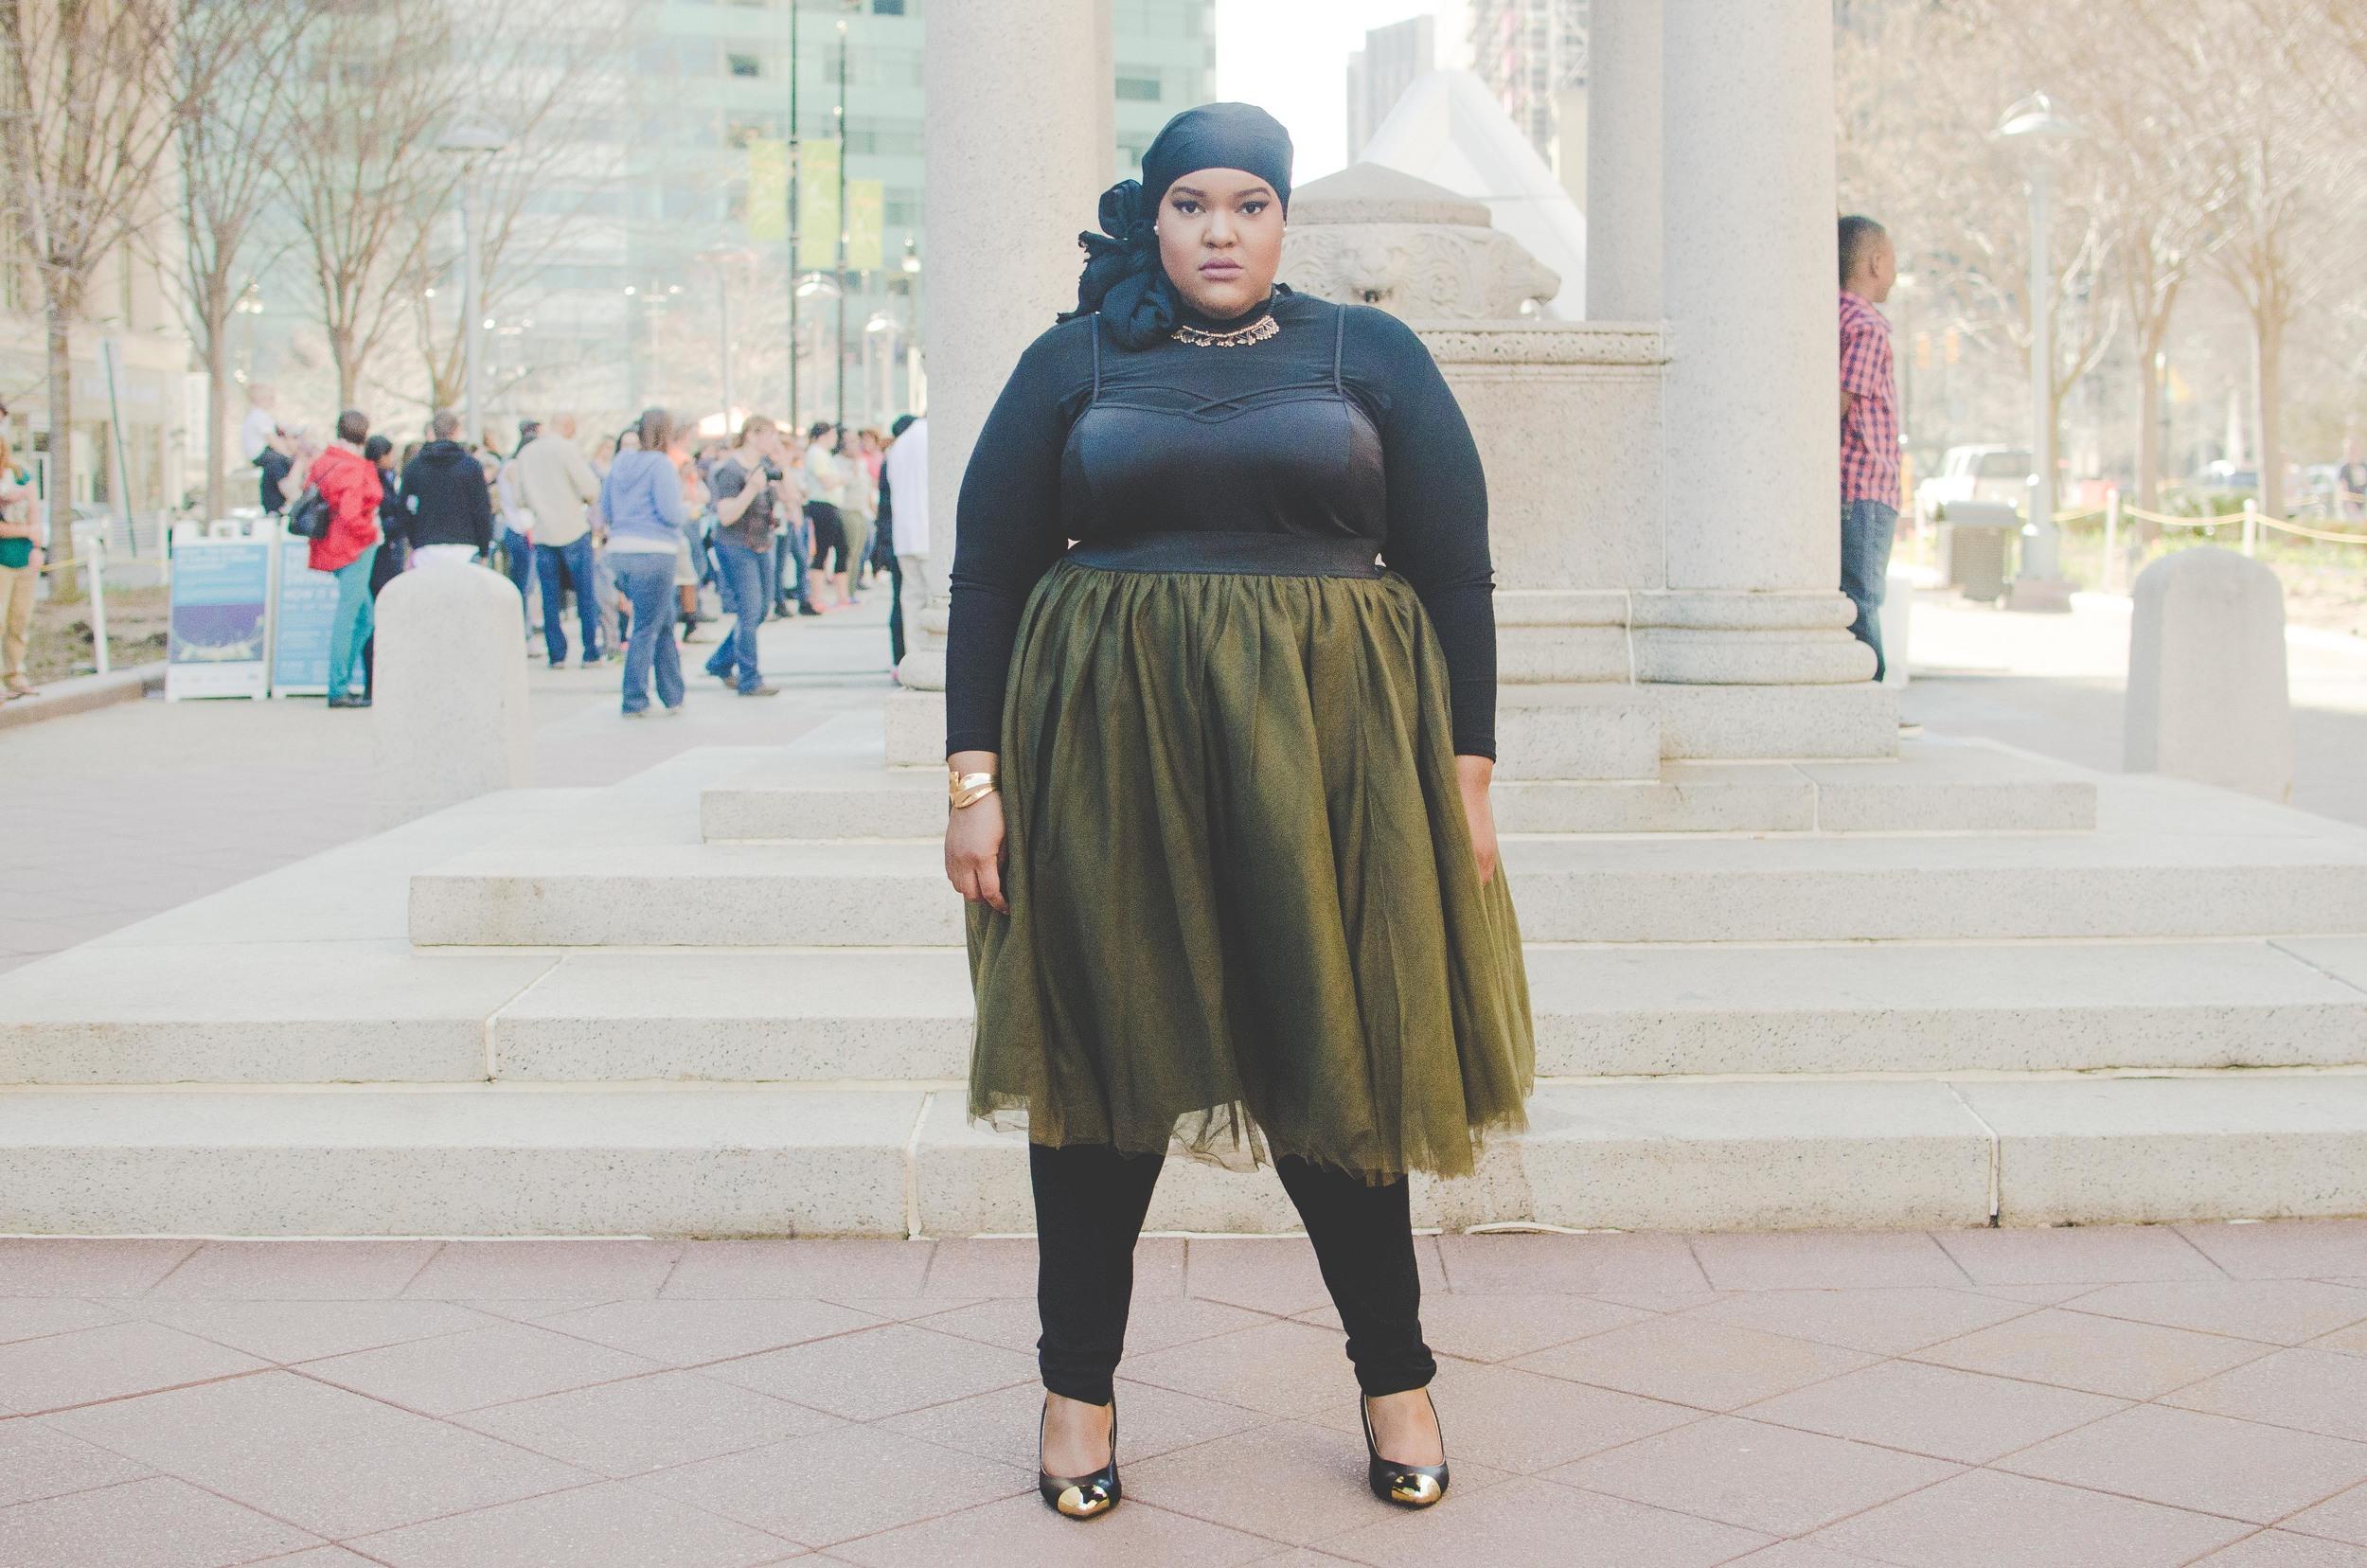 Photo:  Reel Clever Films  MUA:  Madinah M.  Model:  Leah V  Wardrobe:  Society+ Styling Asst:  Holly Haynes Hartter